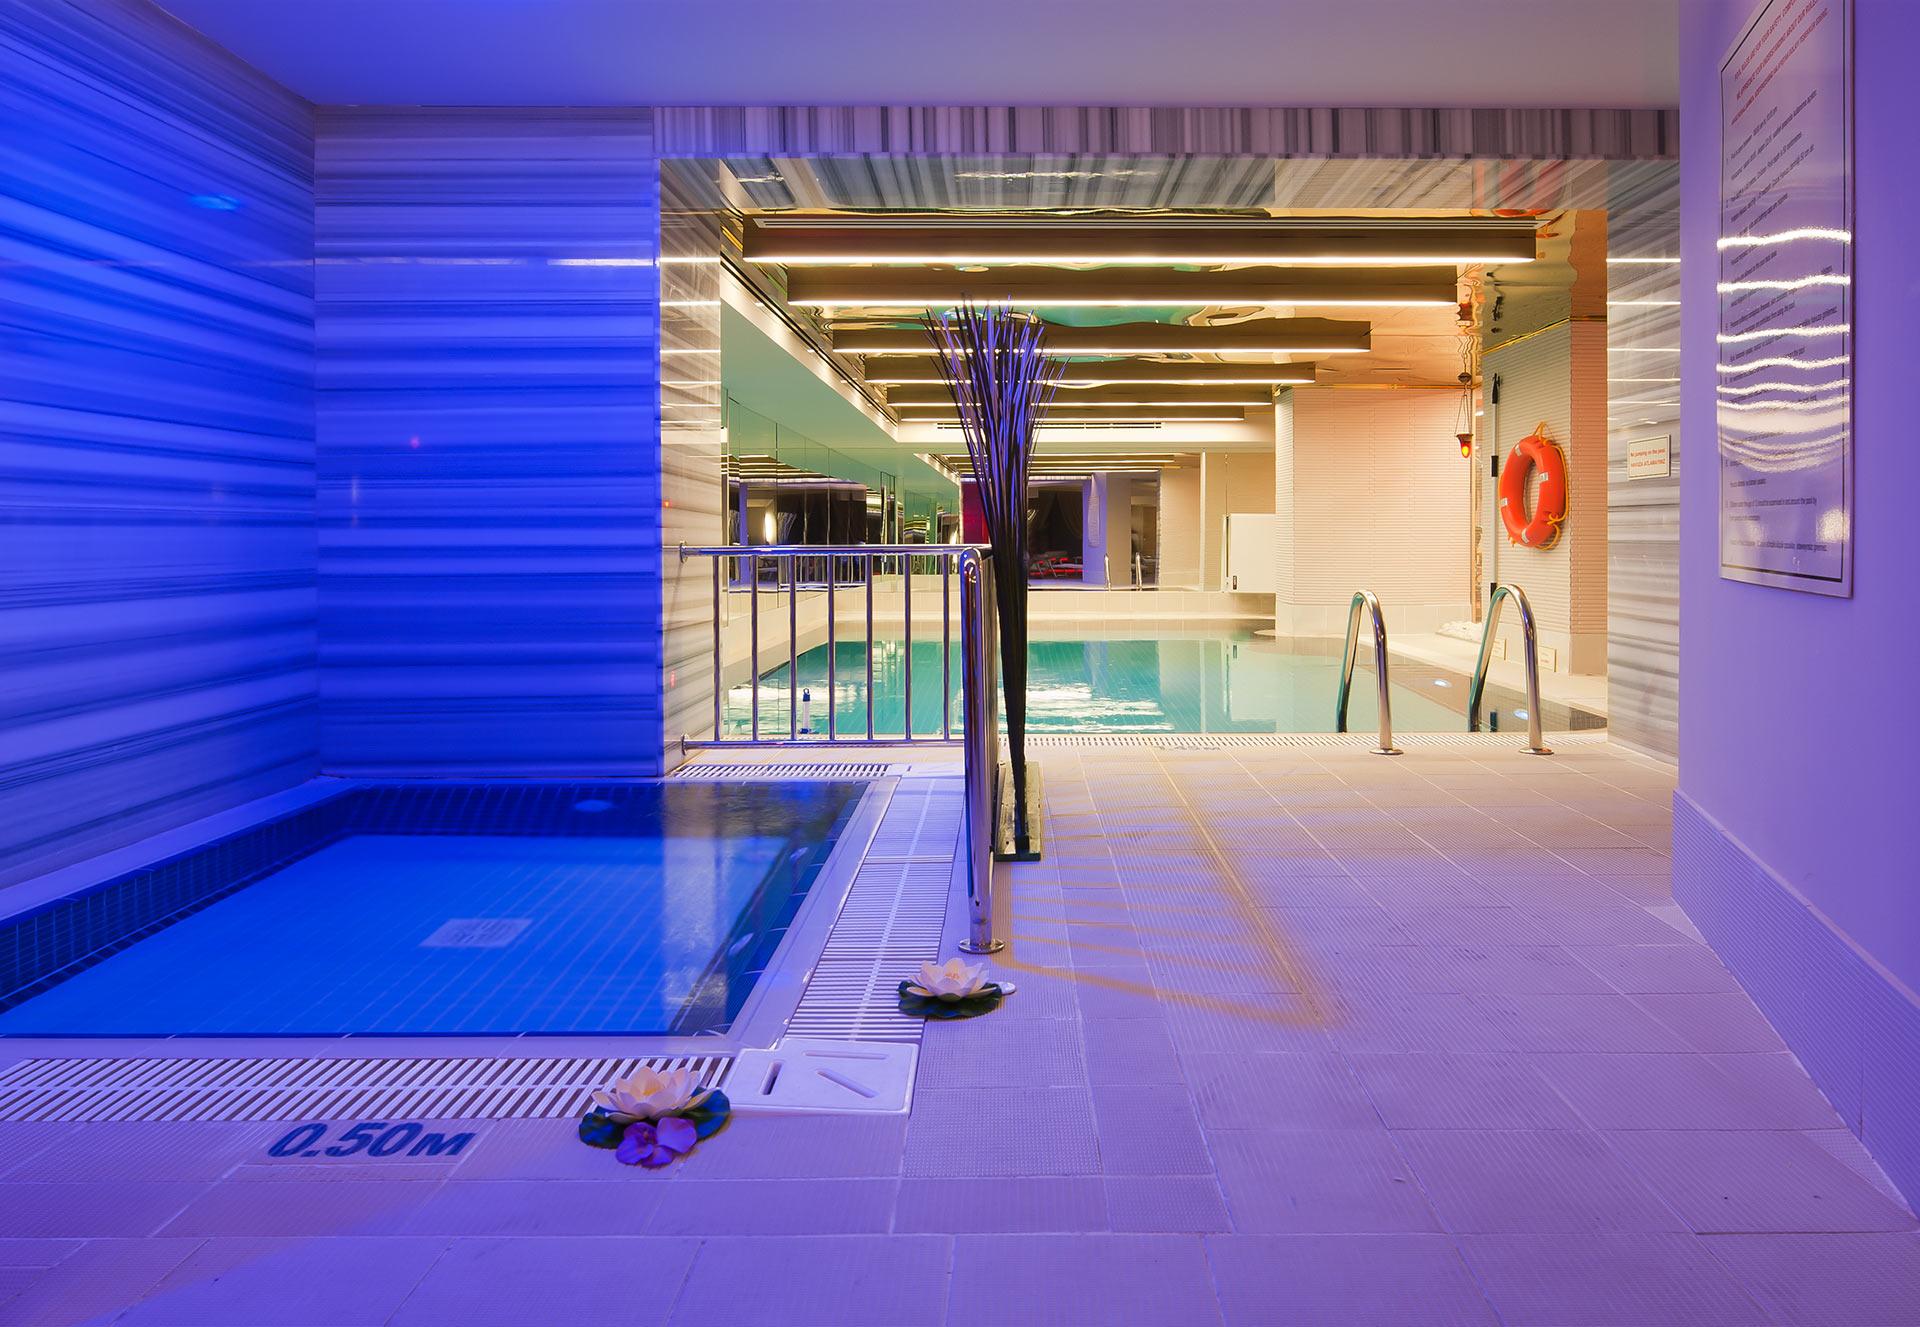 Istanbul_Hotel_Indoor_Swimming_Pool